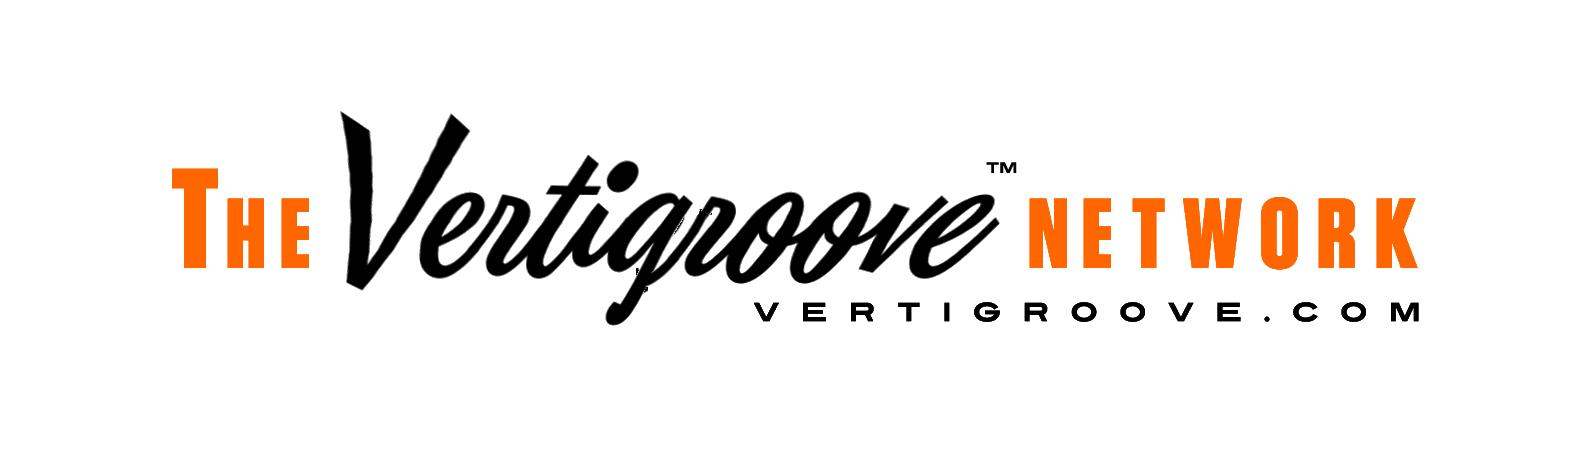 VertigrooveNetworkLogo.V1.png